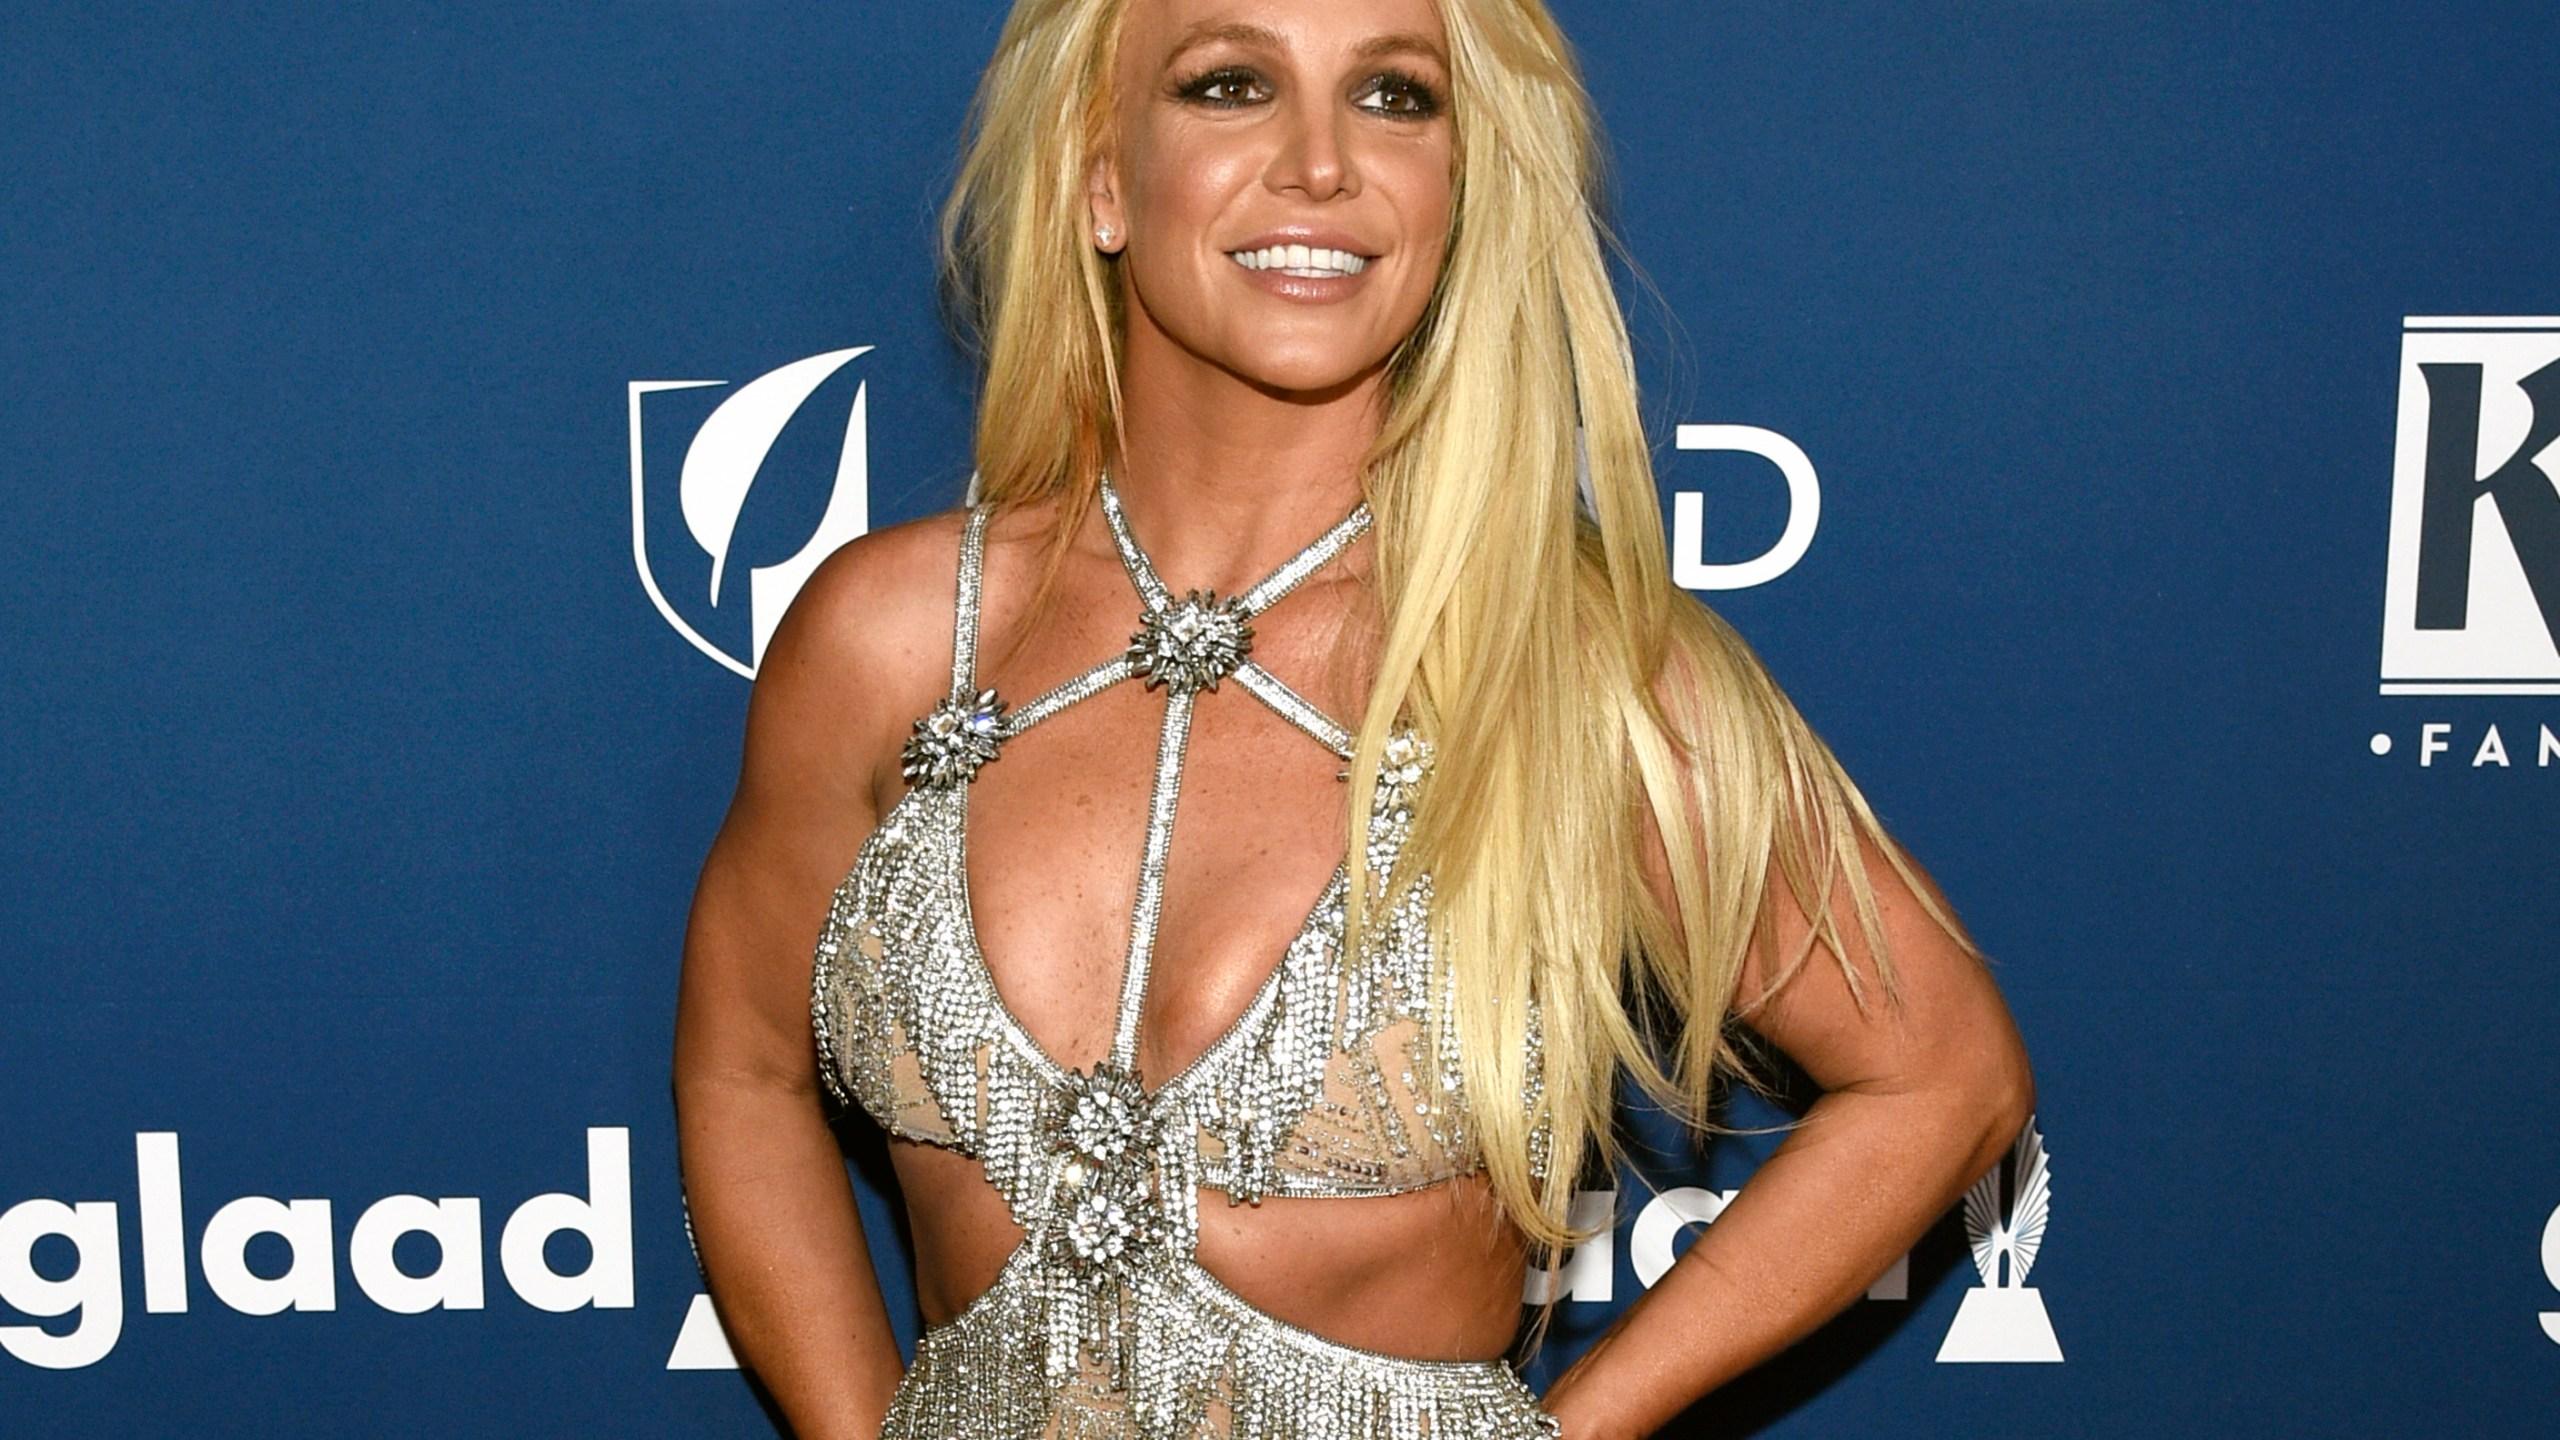 Theater-Britney_Spears_53823-159532.jpg30392135